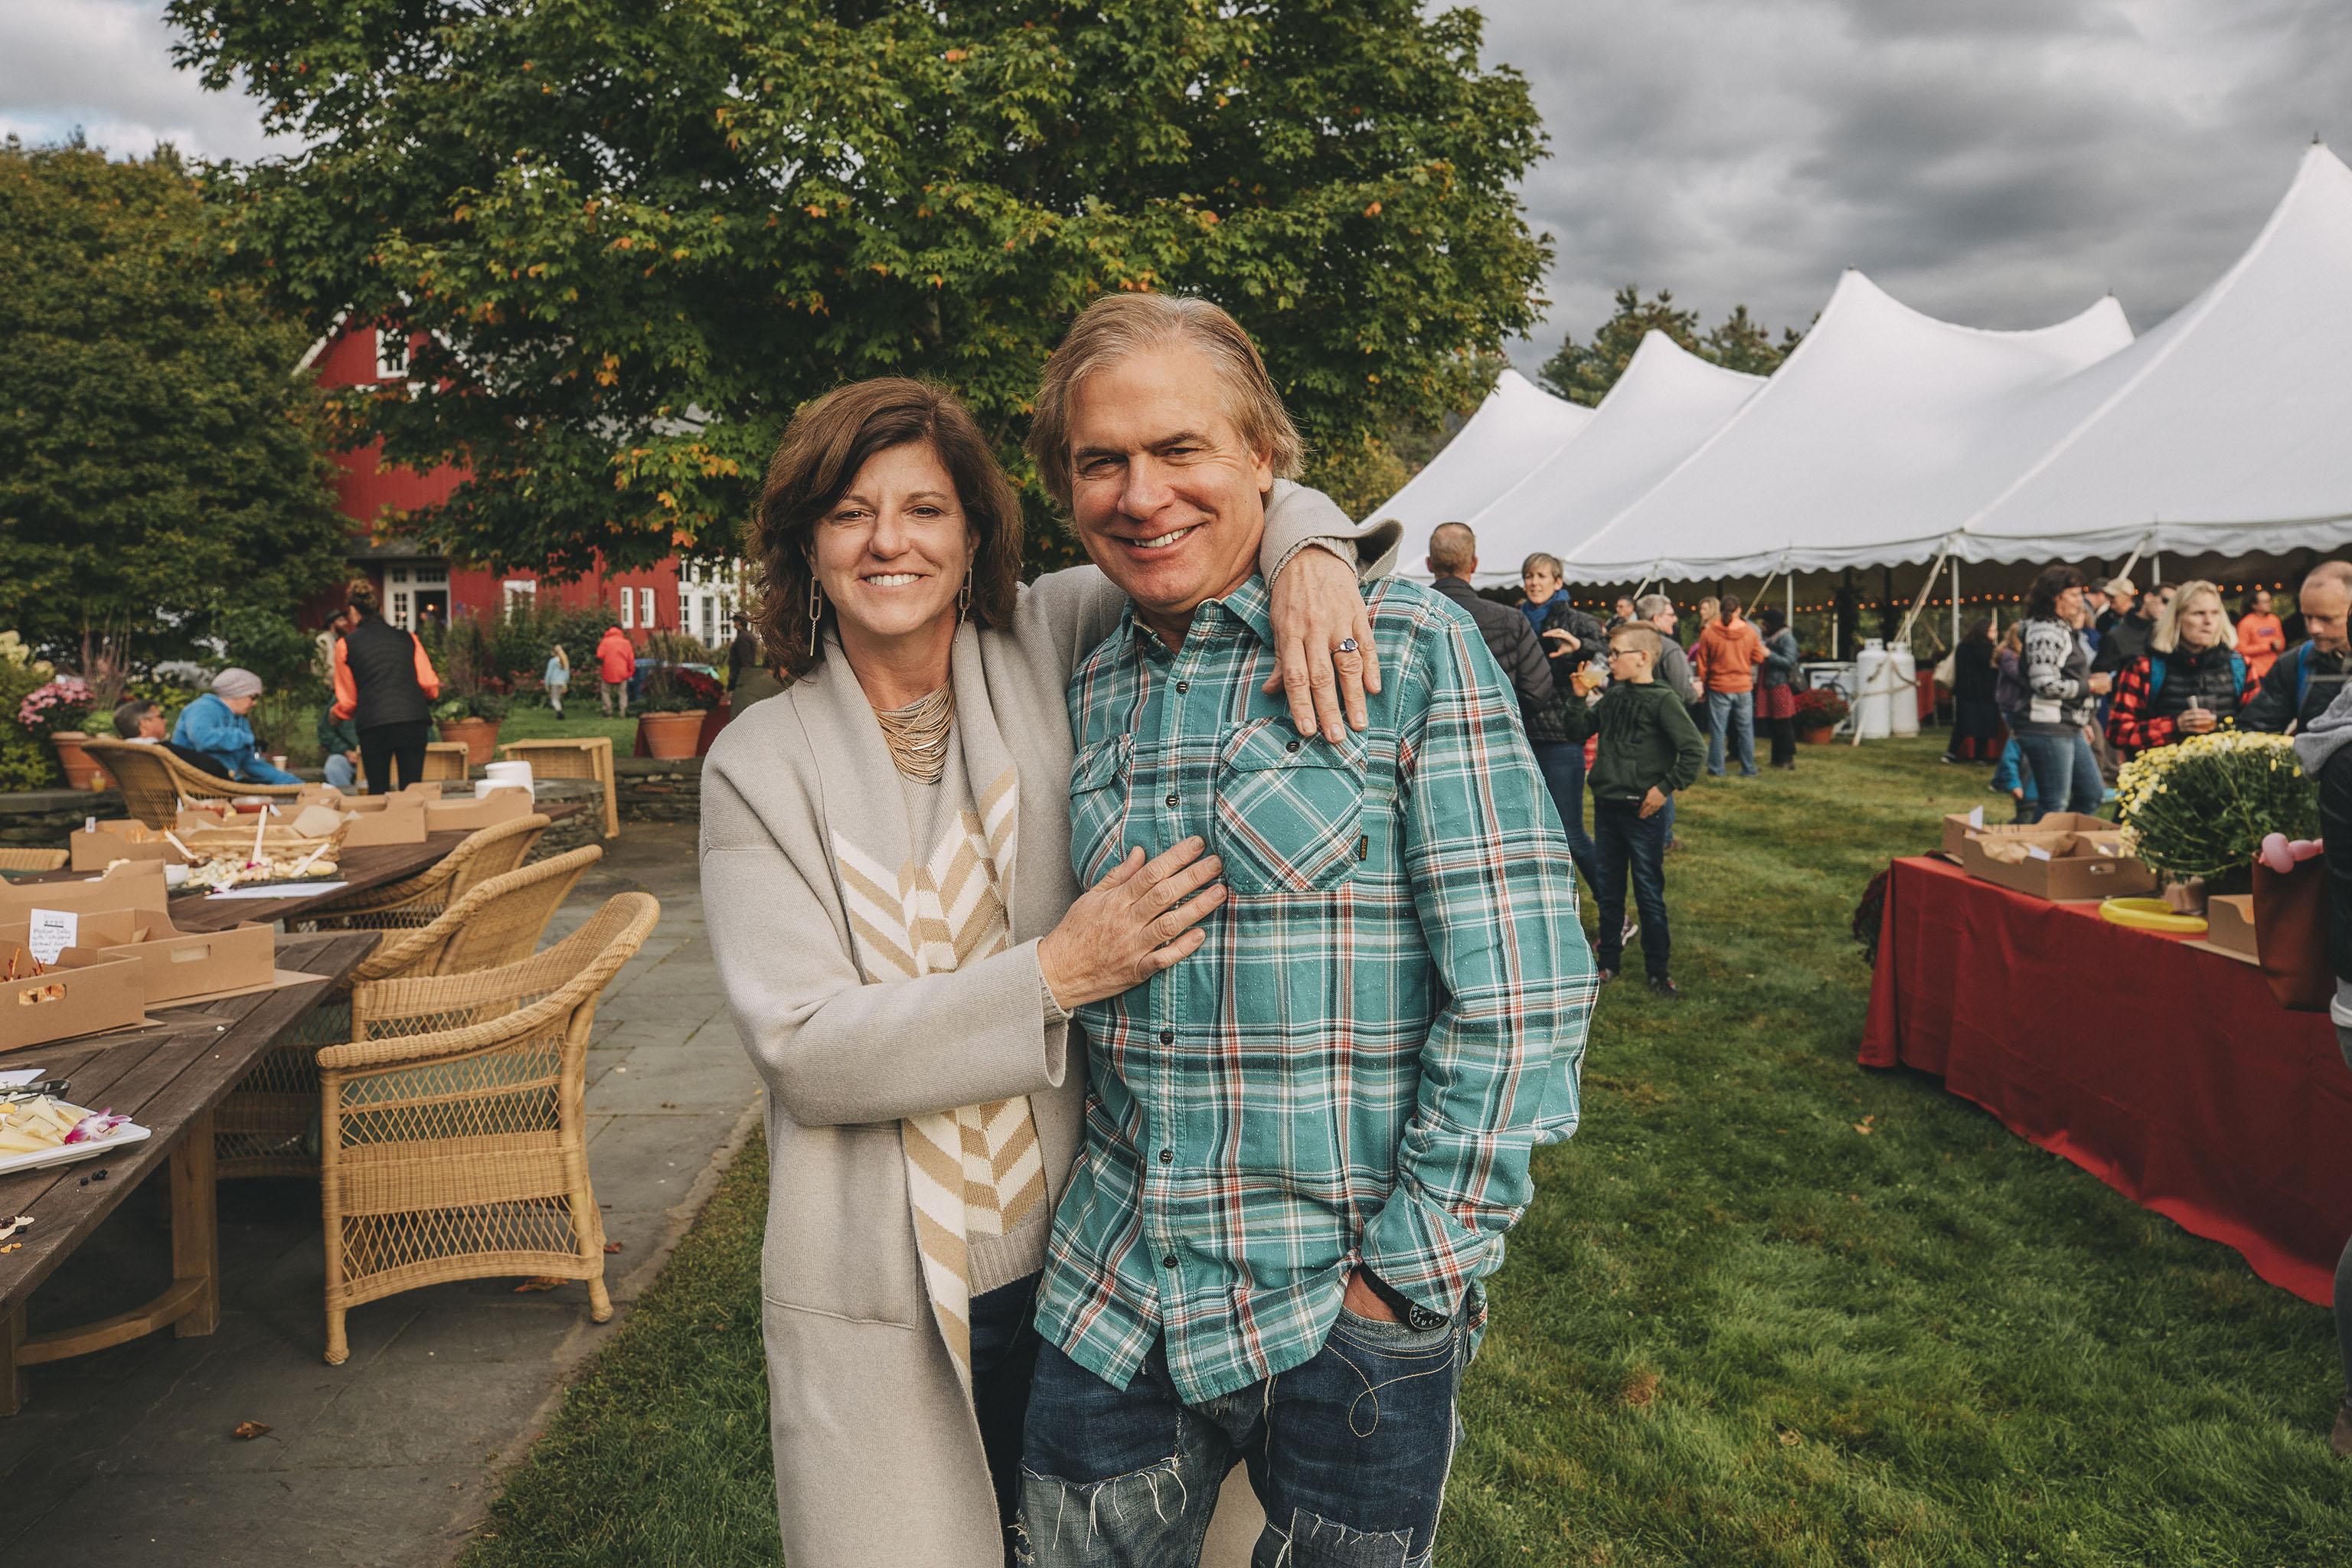 Donna Carpenter and her husband Jake Burton Carpenter.